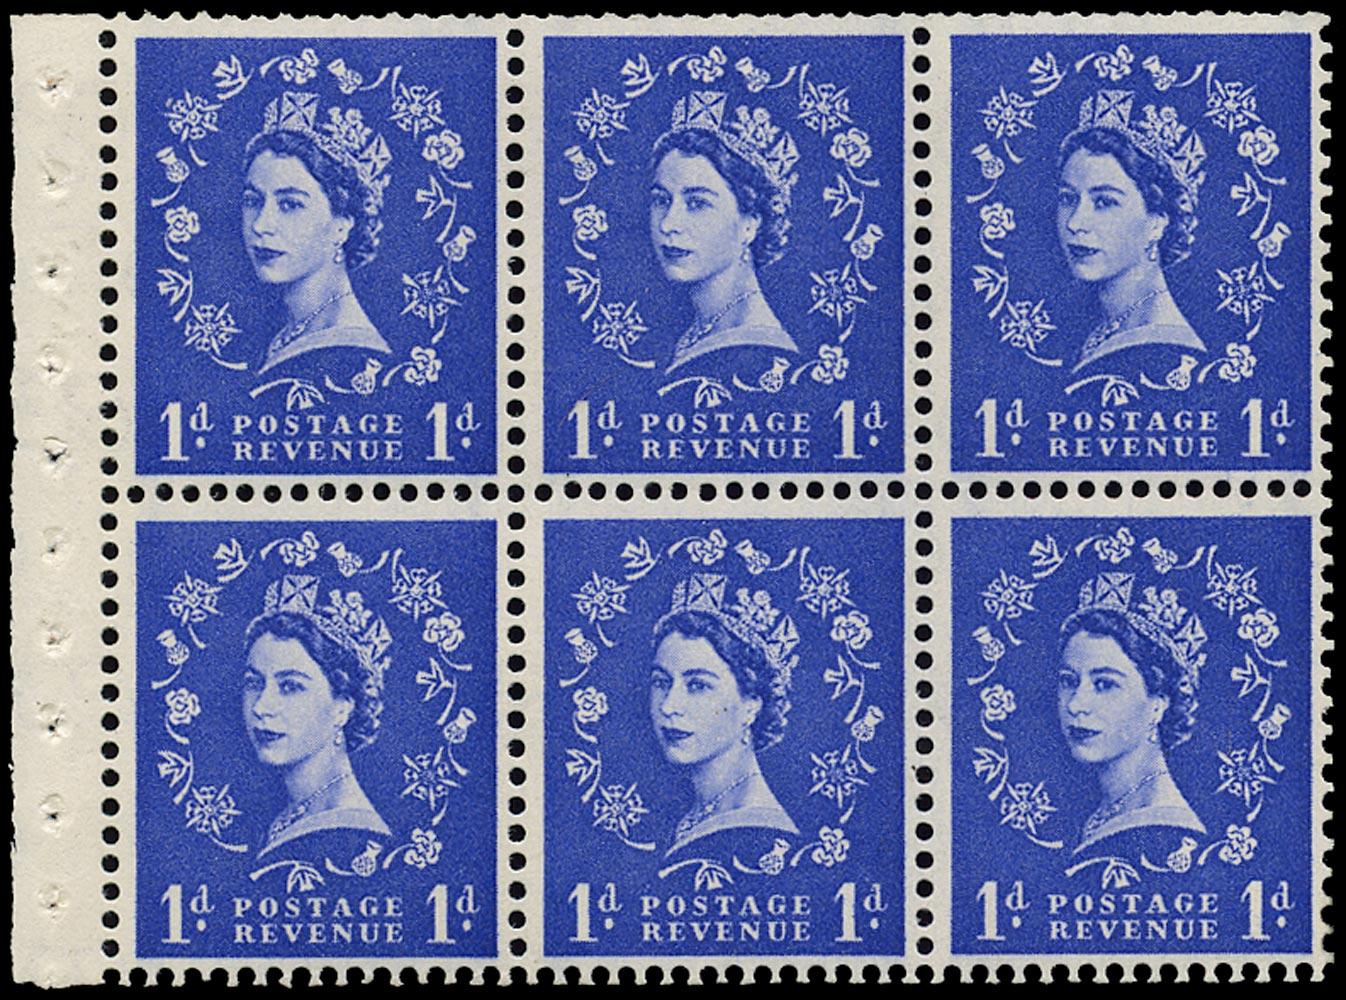 GB 1958  SG588lWi Booklet pane rose flaw variety